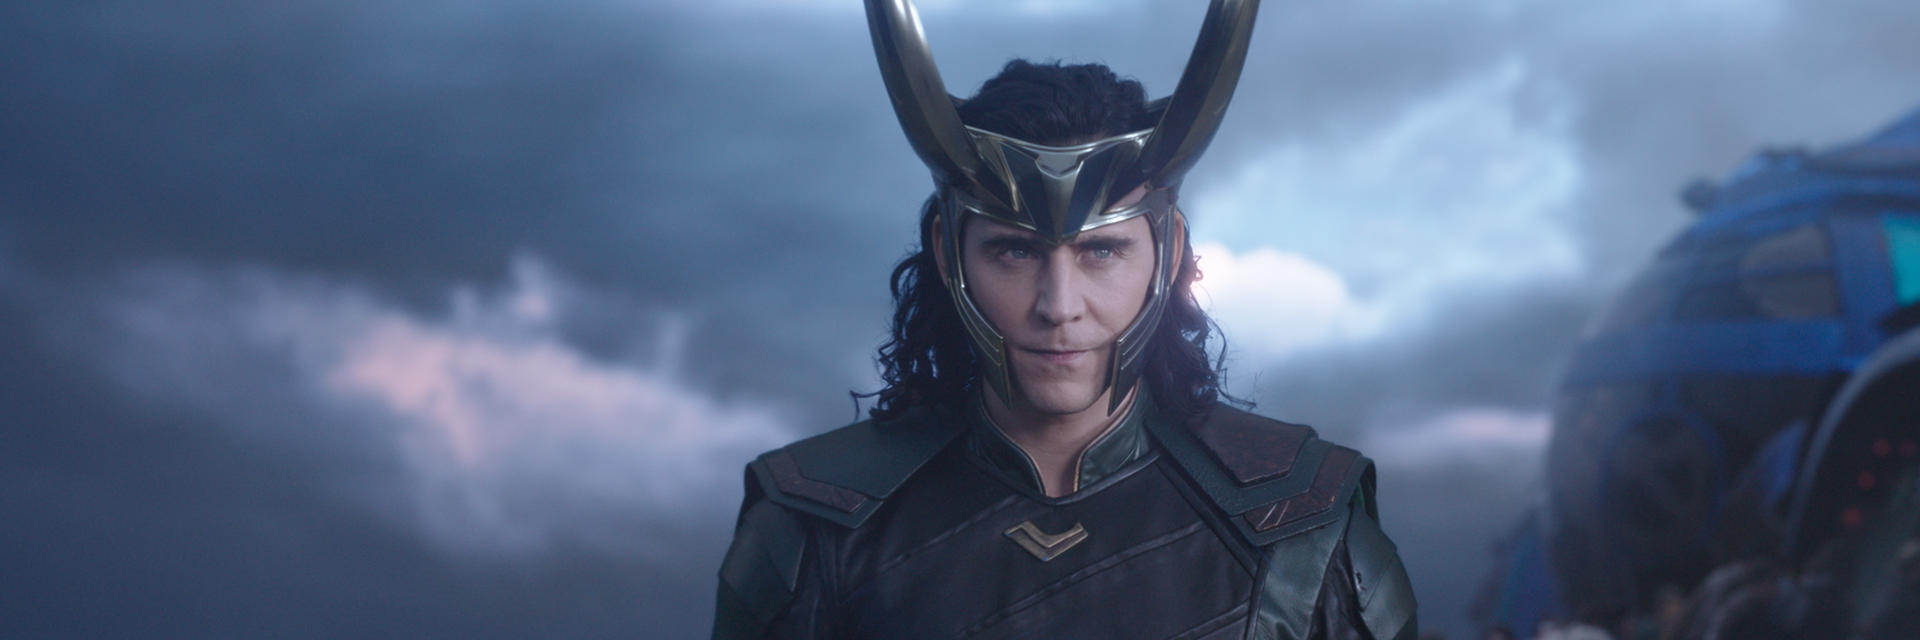 Loki On Screen Powers, Enemies, History | Marvel